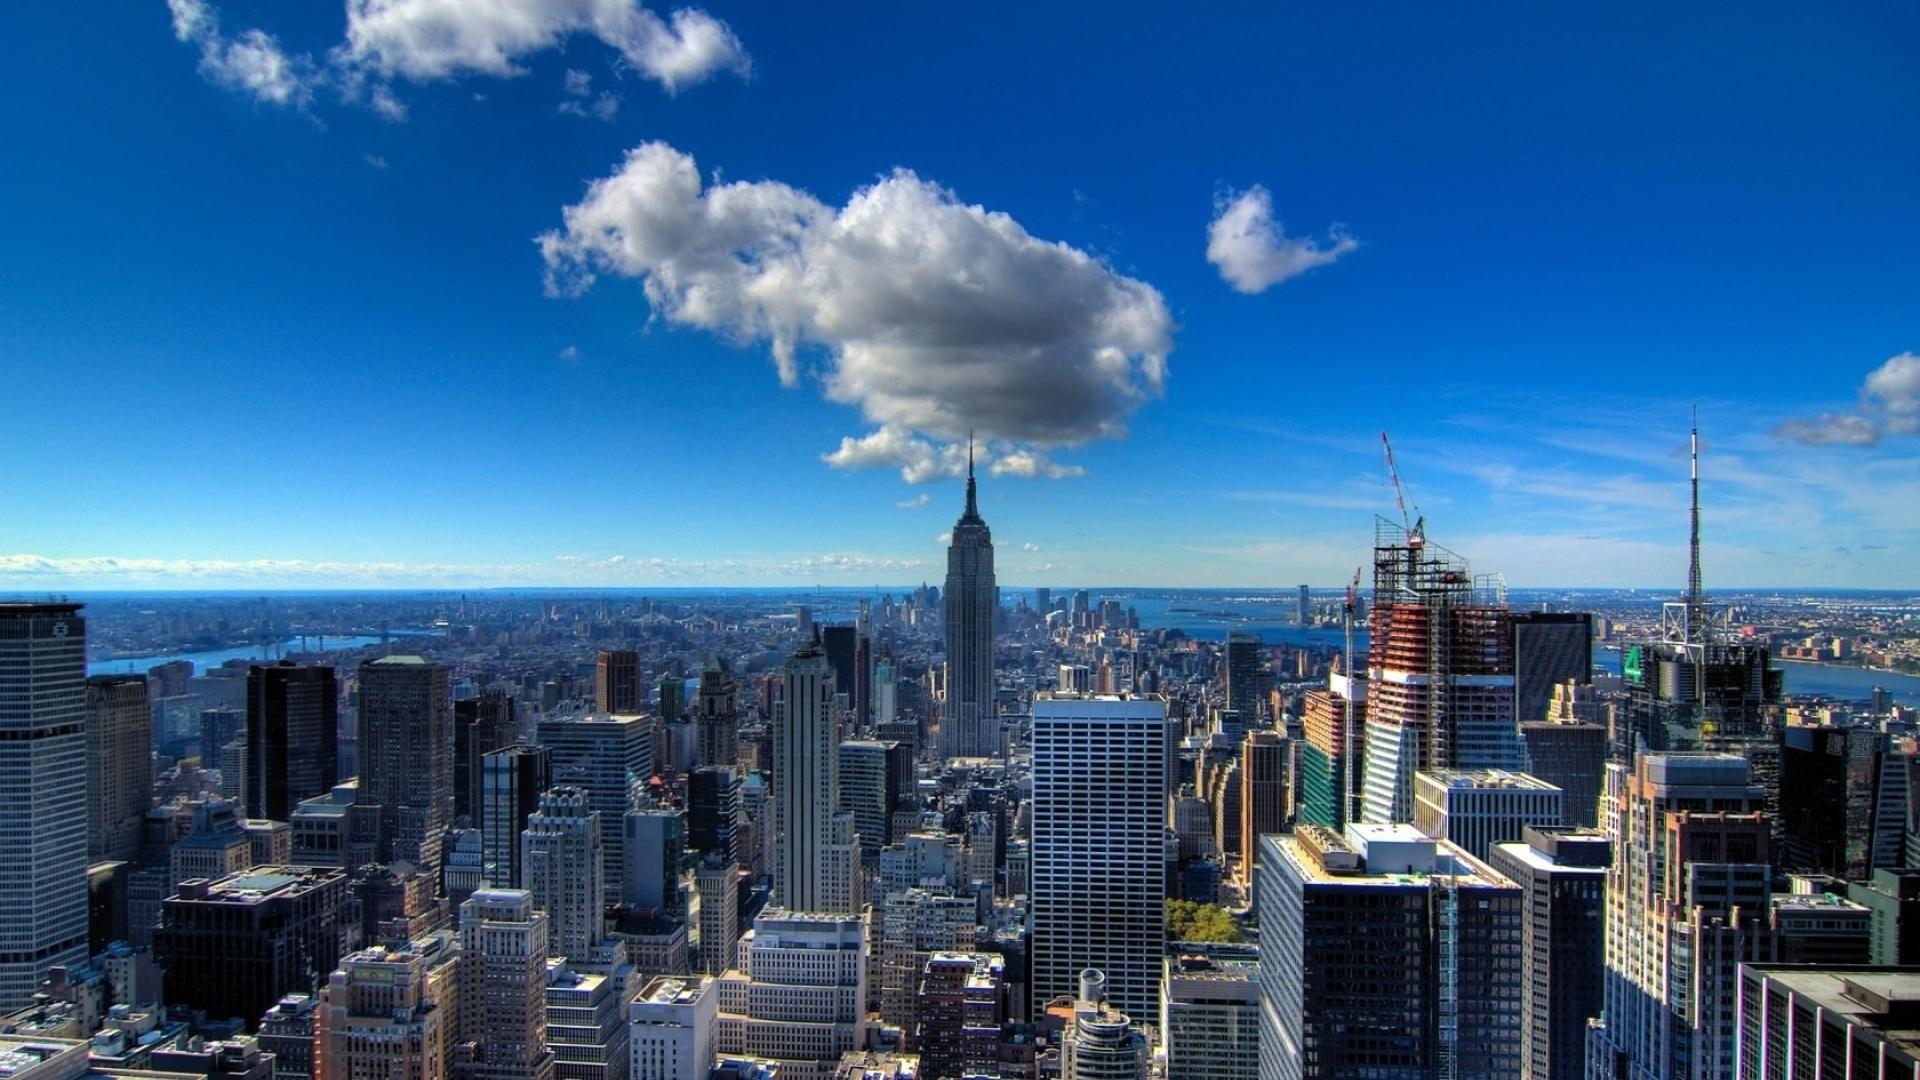 New York 1080p Wallpaper 79 Images